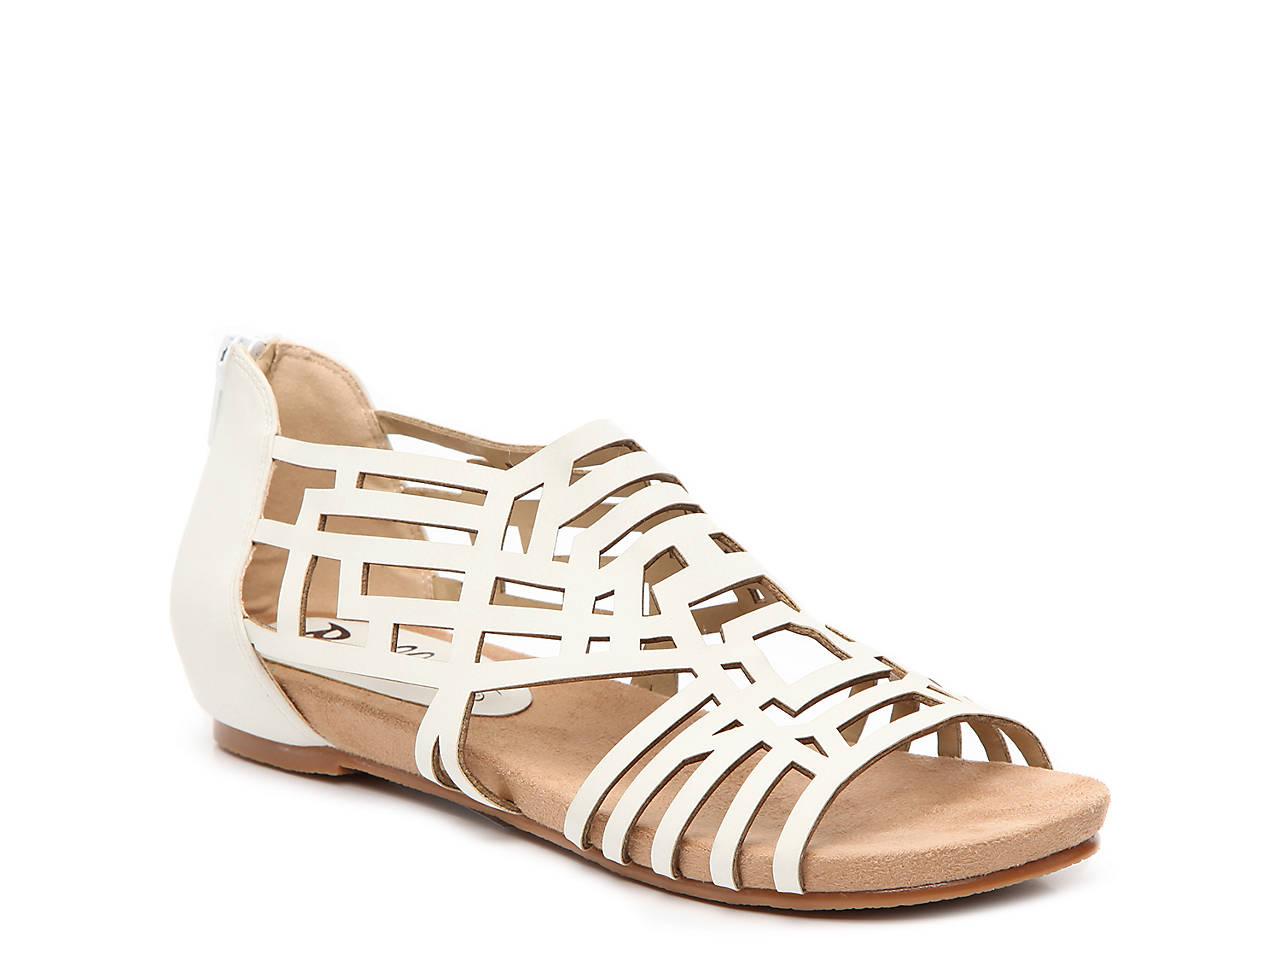 Nazareth Wedge Sandal by Bellini